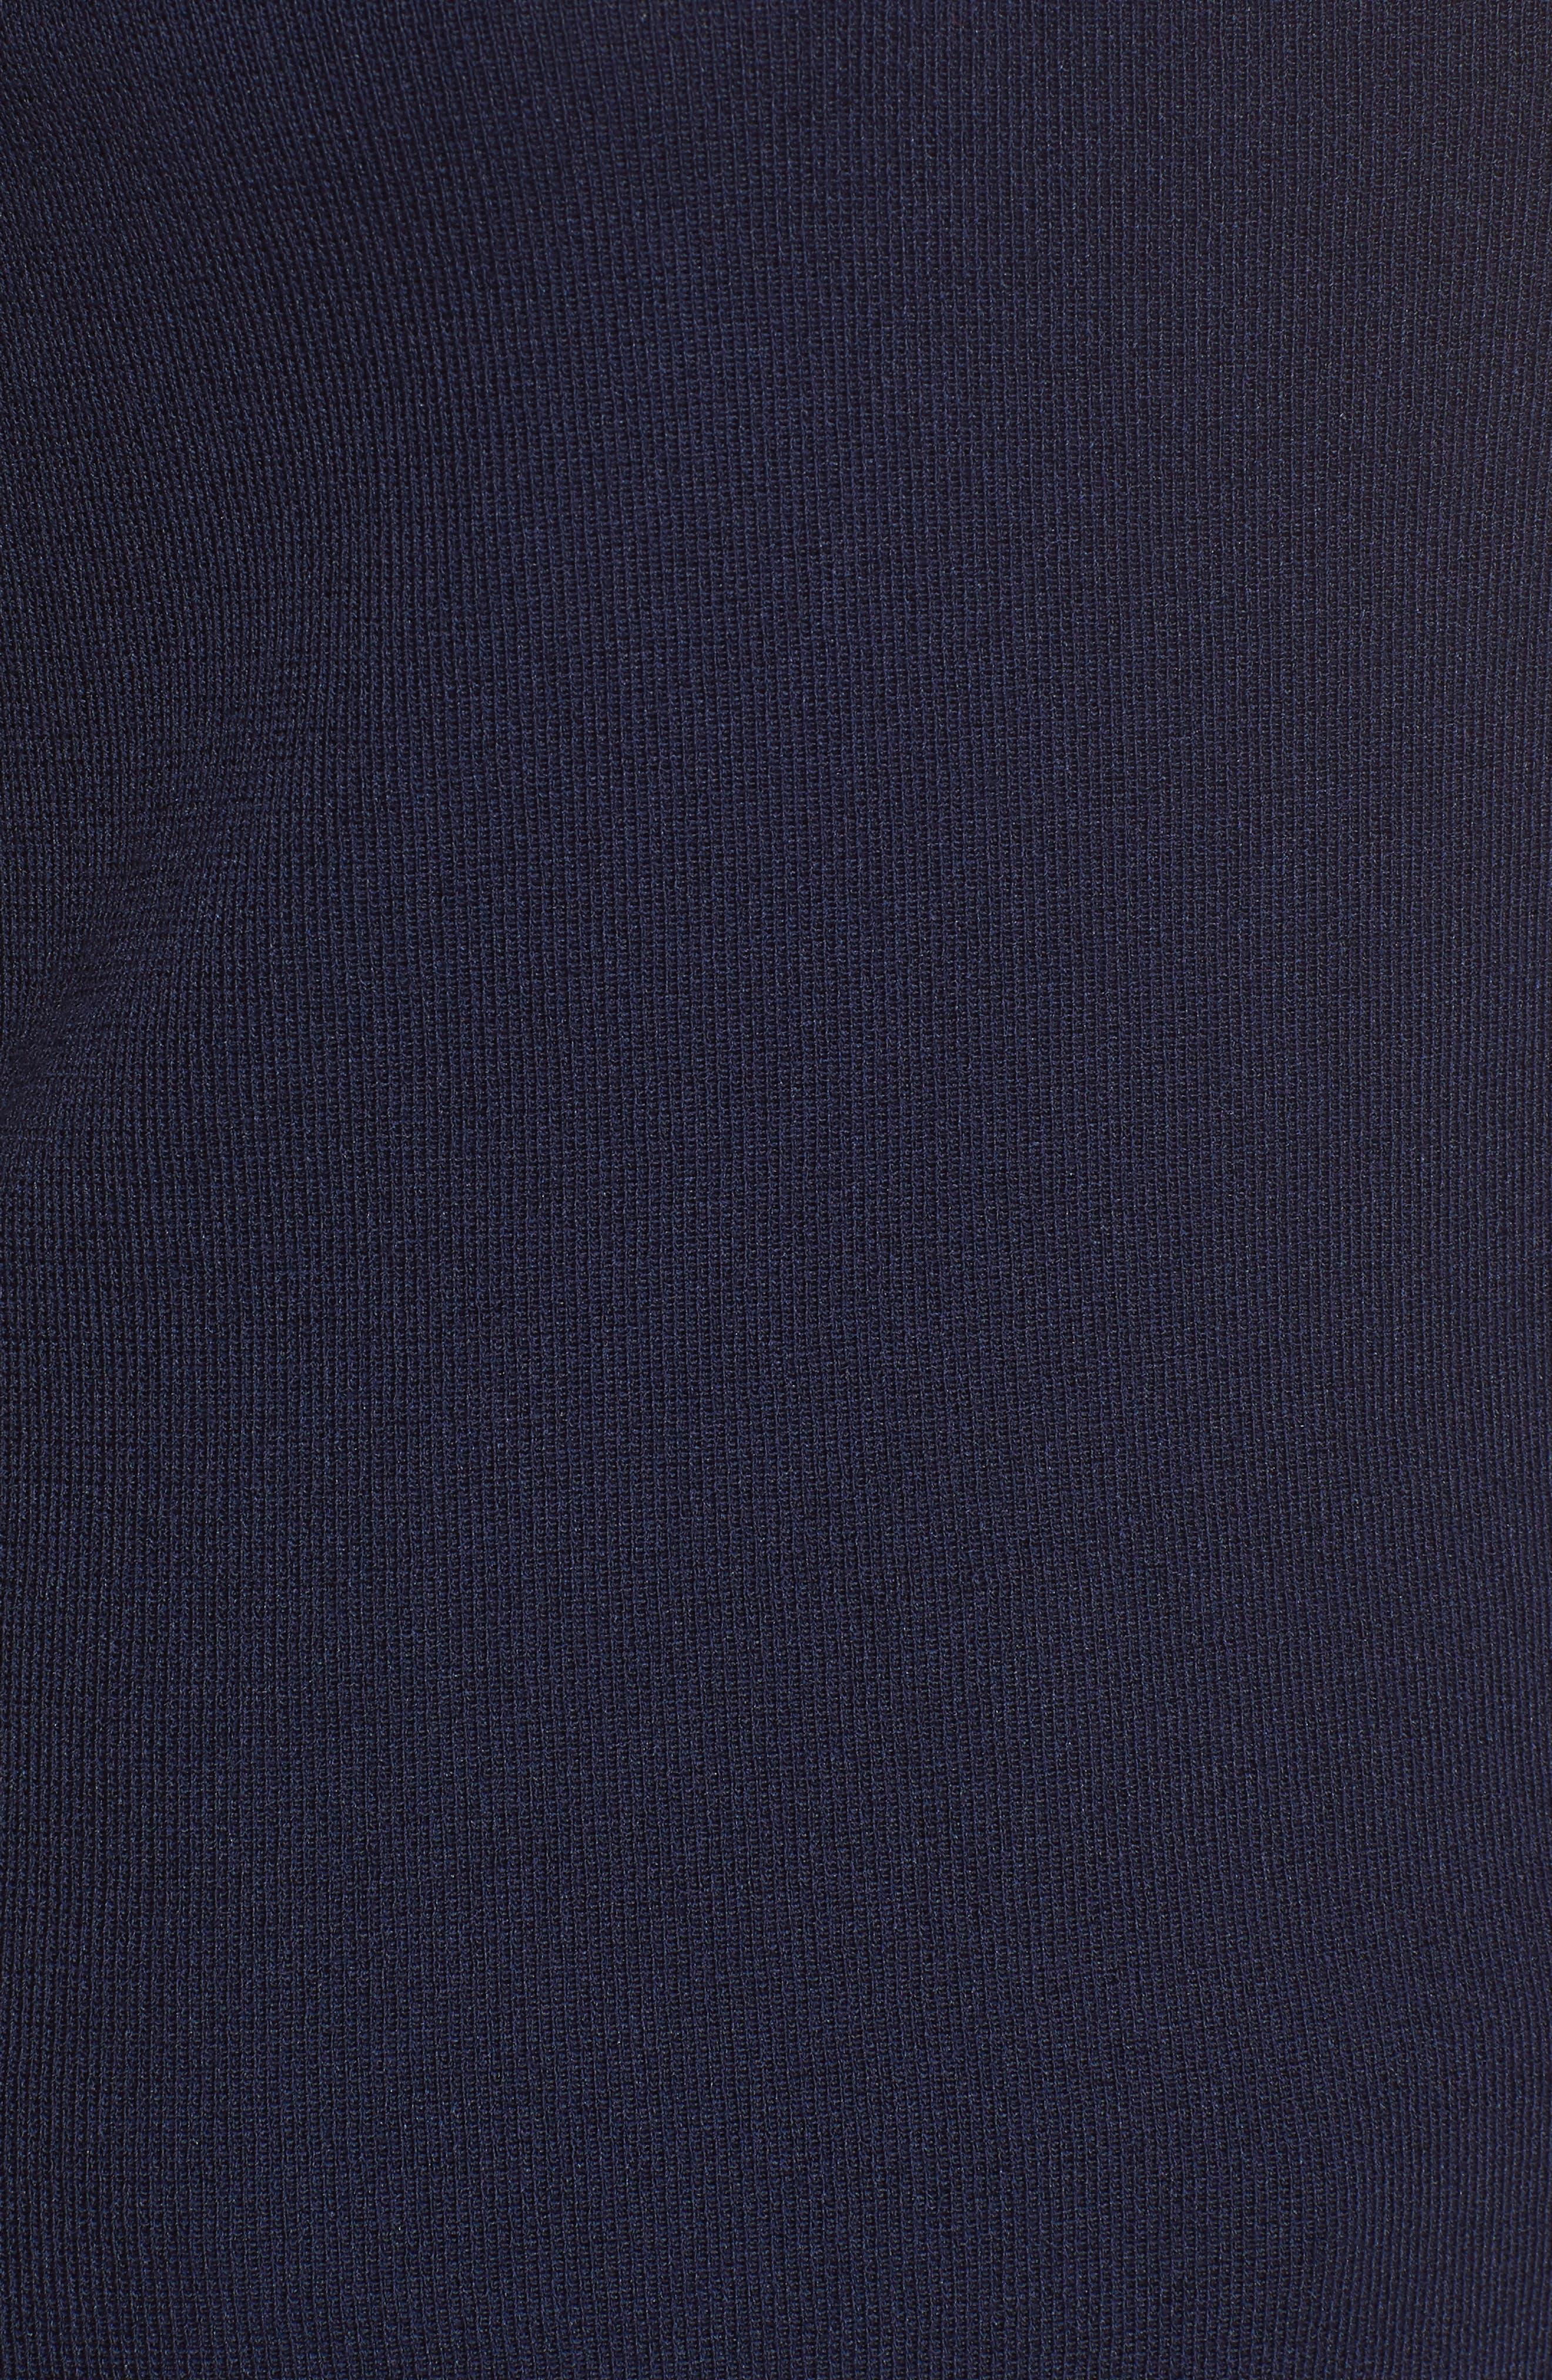 New York Sleeveless Knit Tank,                             Alternate thumbnail 6, color,                             Breton Blue